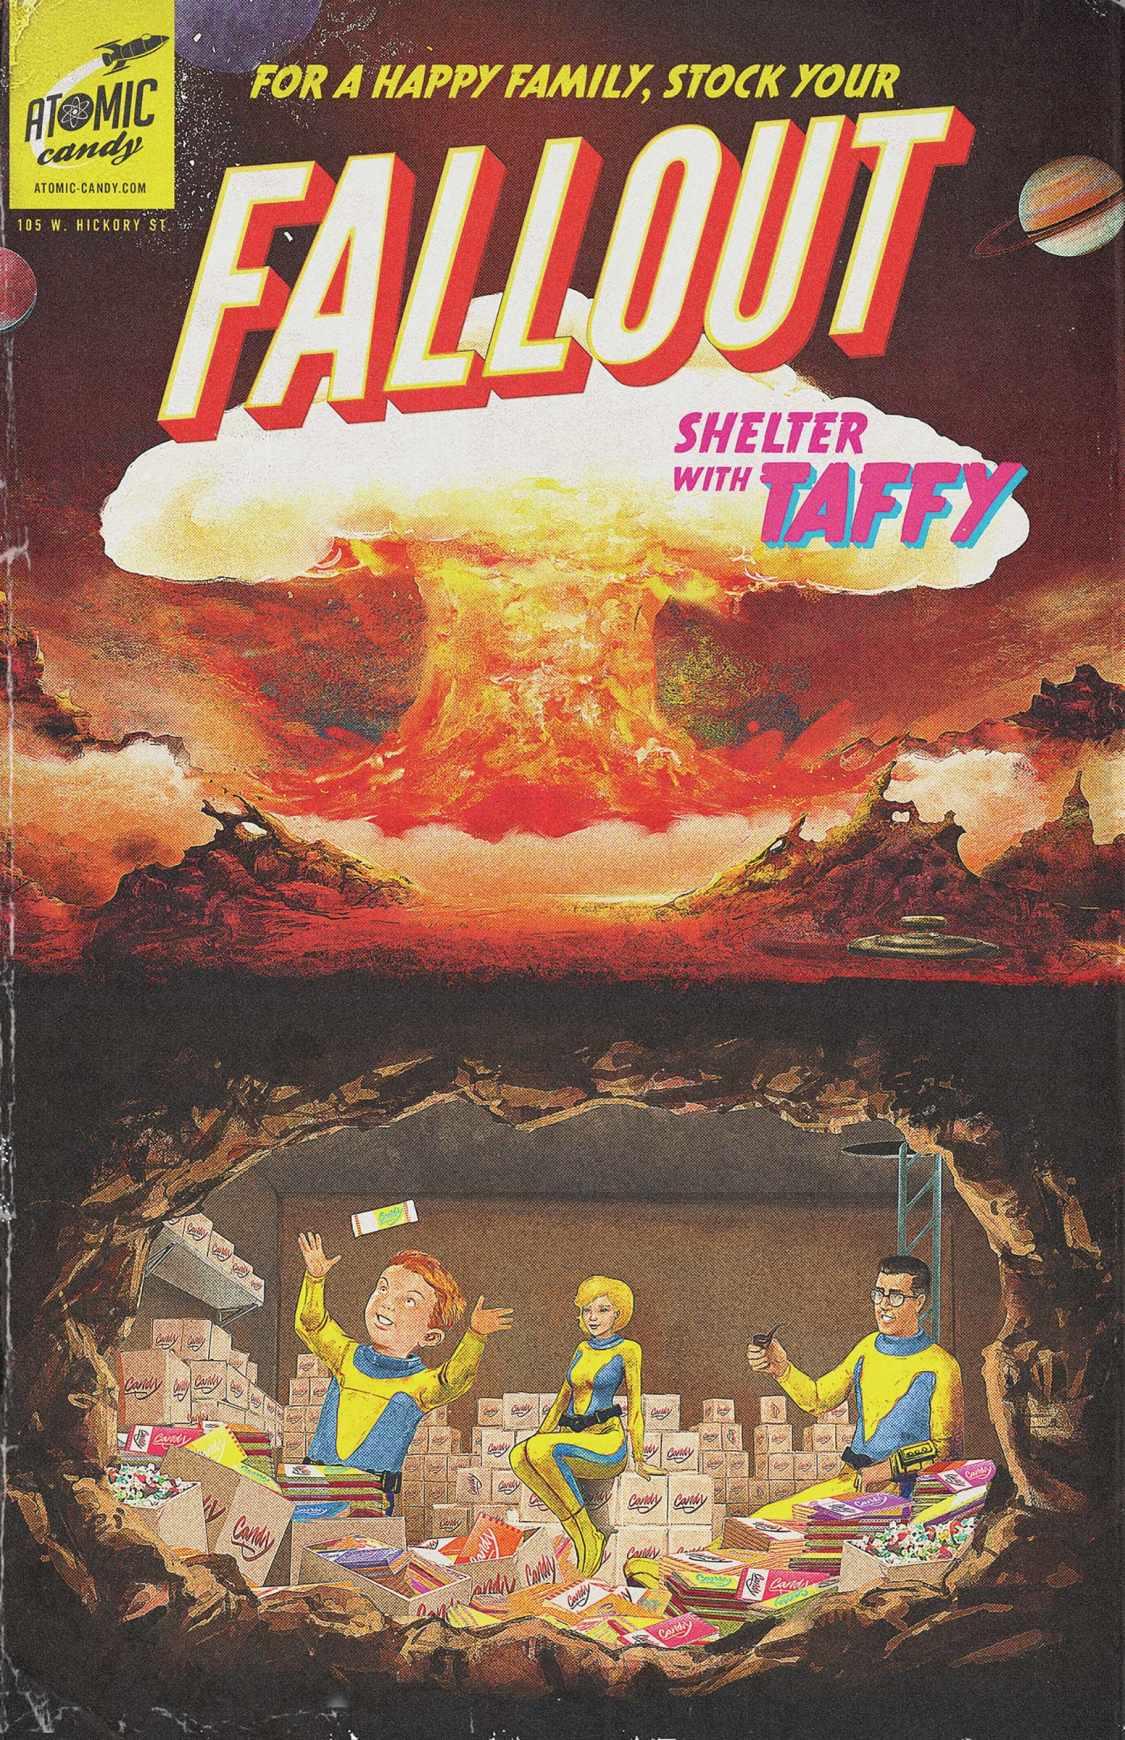 atomiccandy_fallout_aotw